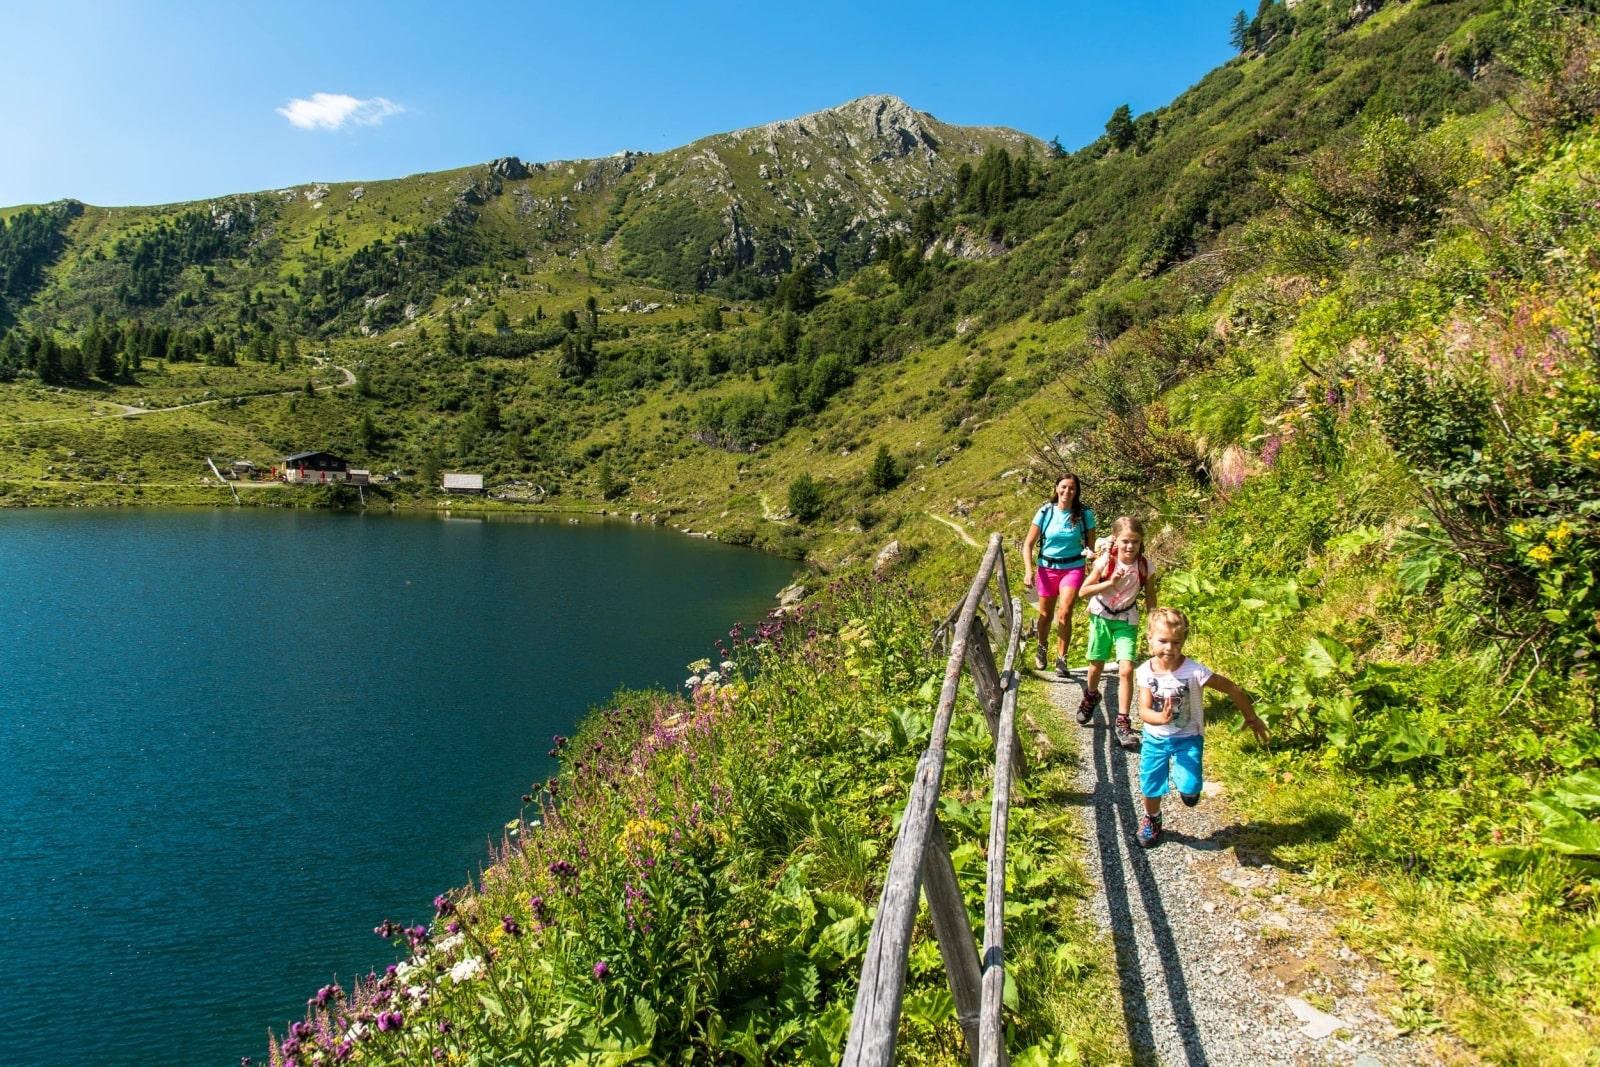 Heidi-Chalet-Falkert-Heidialm-Falkertsee-Rundweg-Natur-Wandern